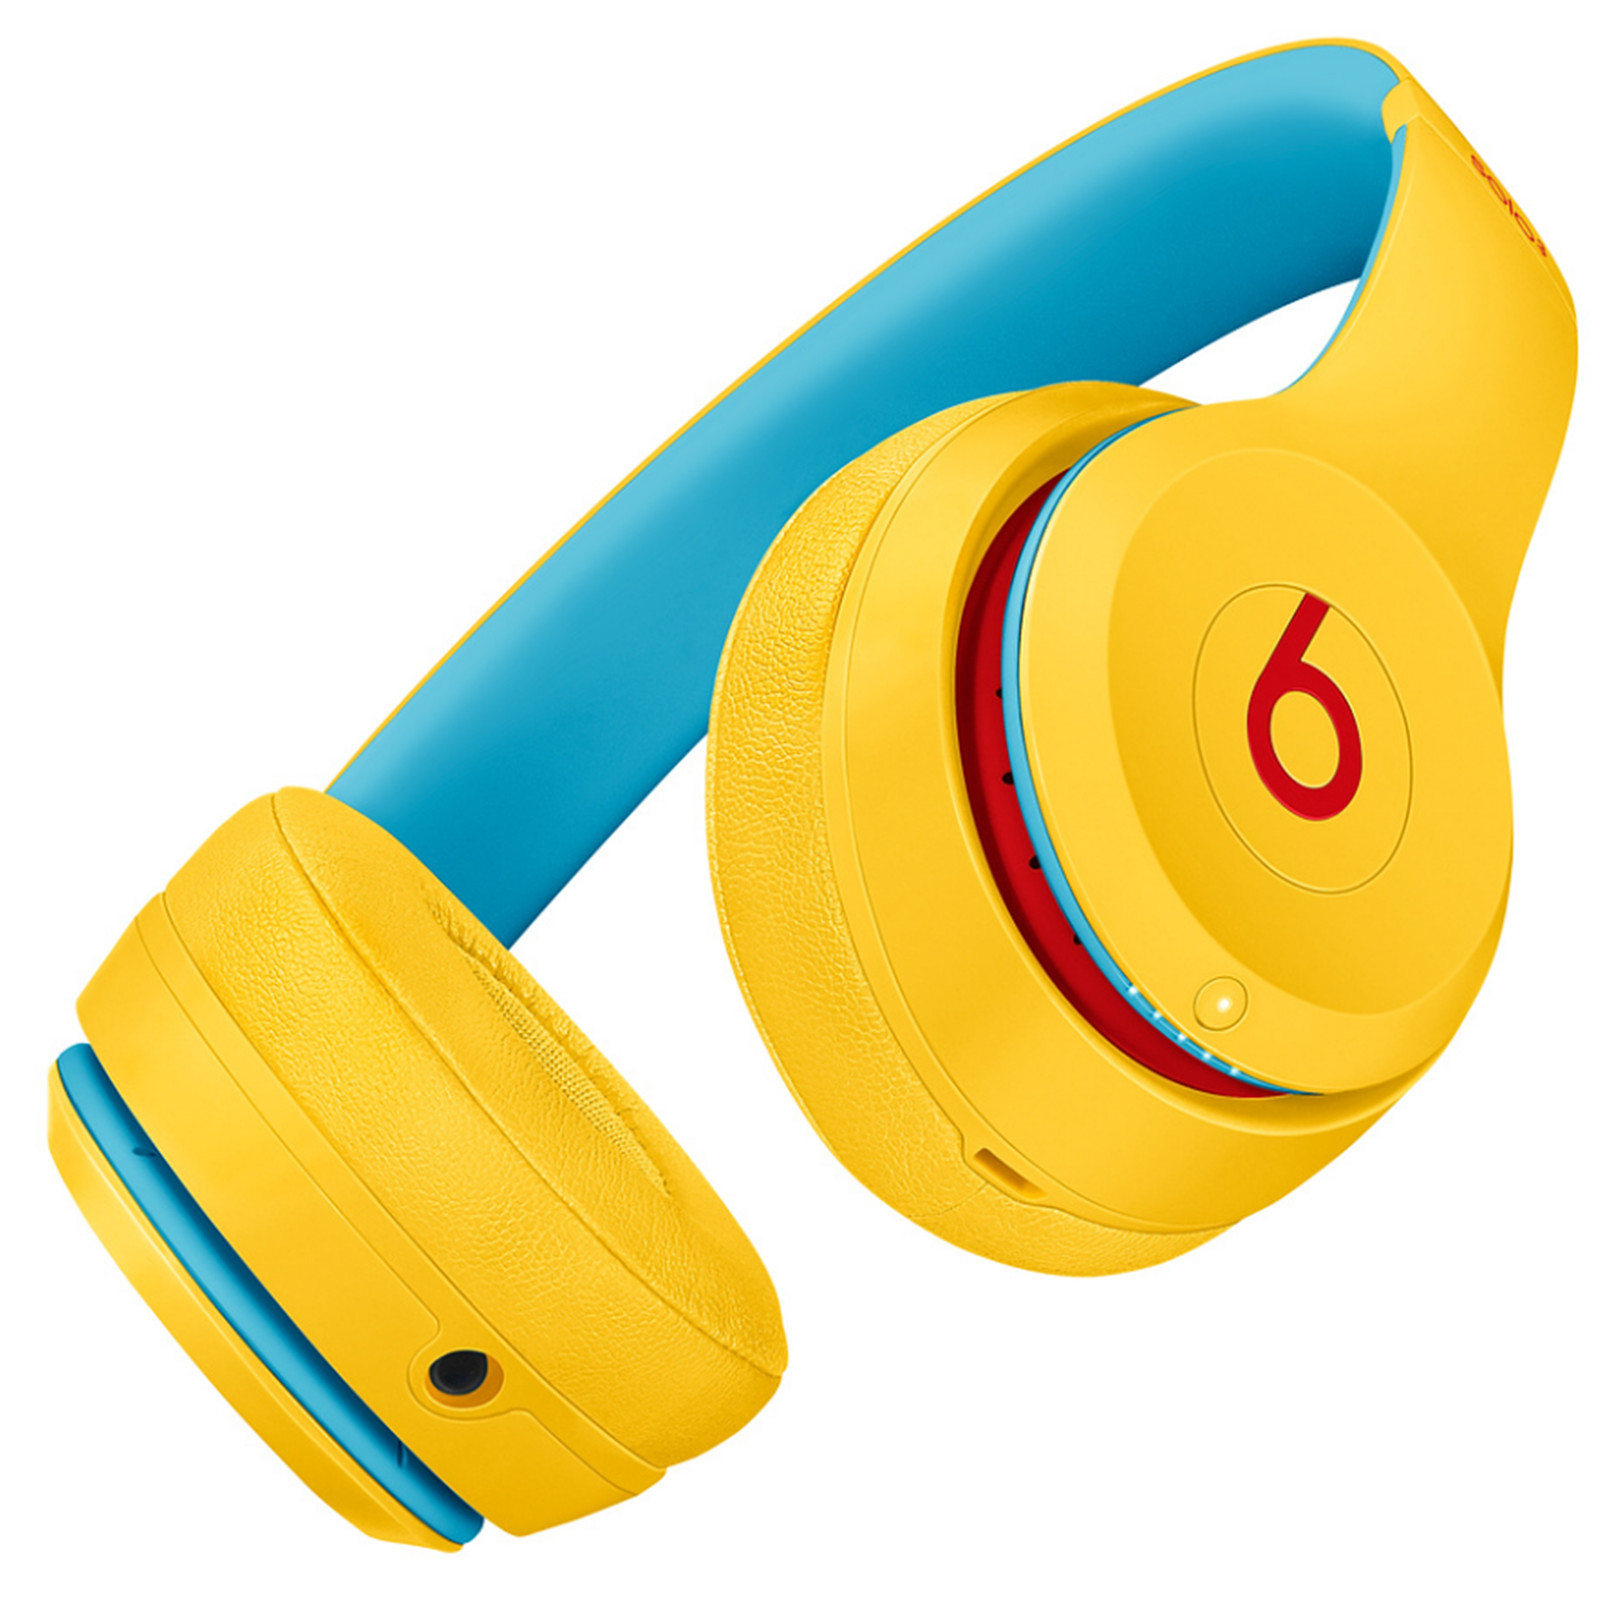 Beats Solo3 Wireless On-Ear Headphones - Club Yellow image